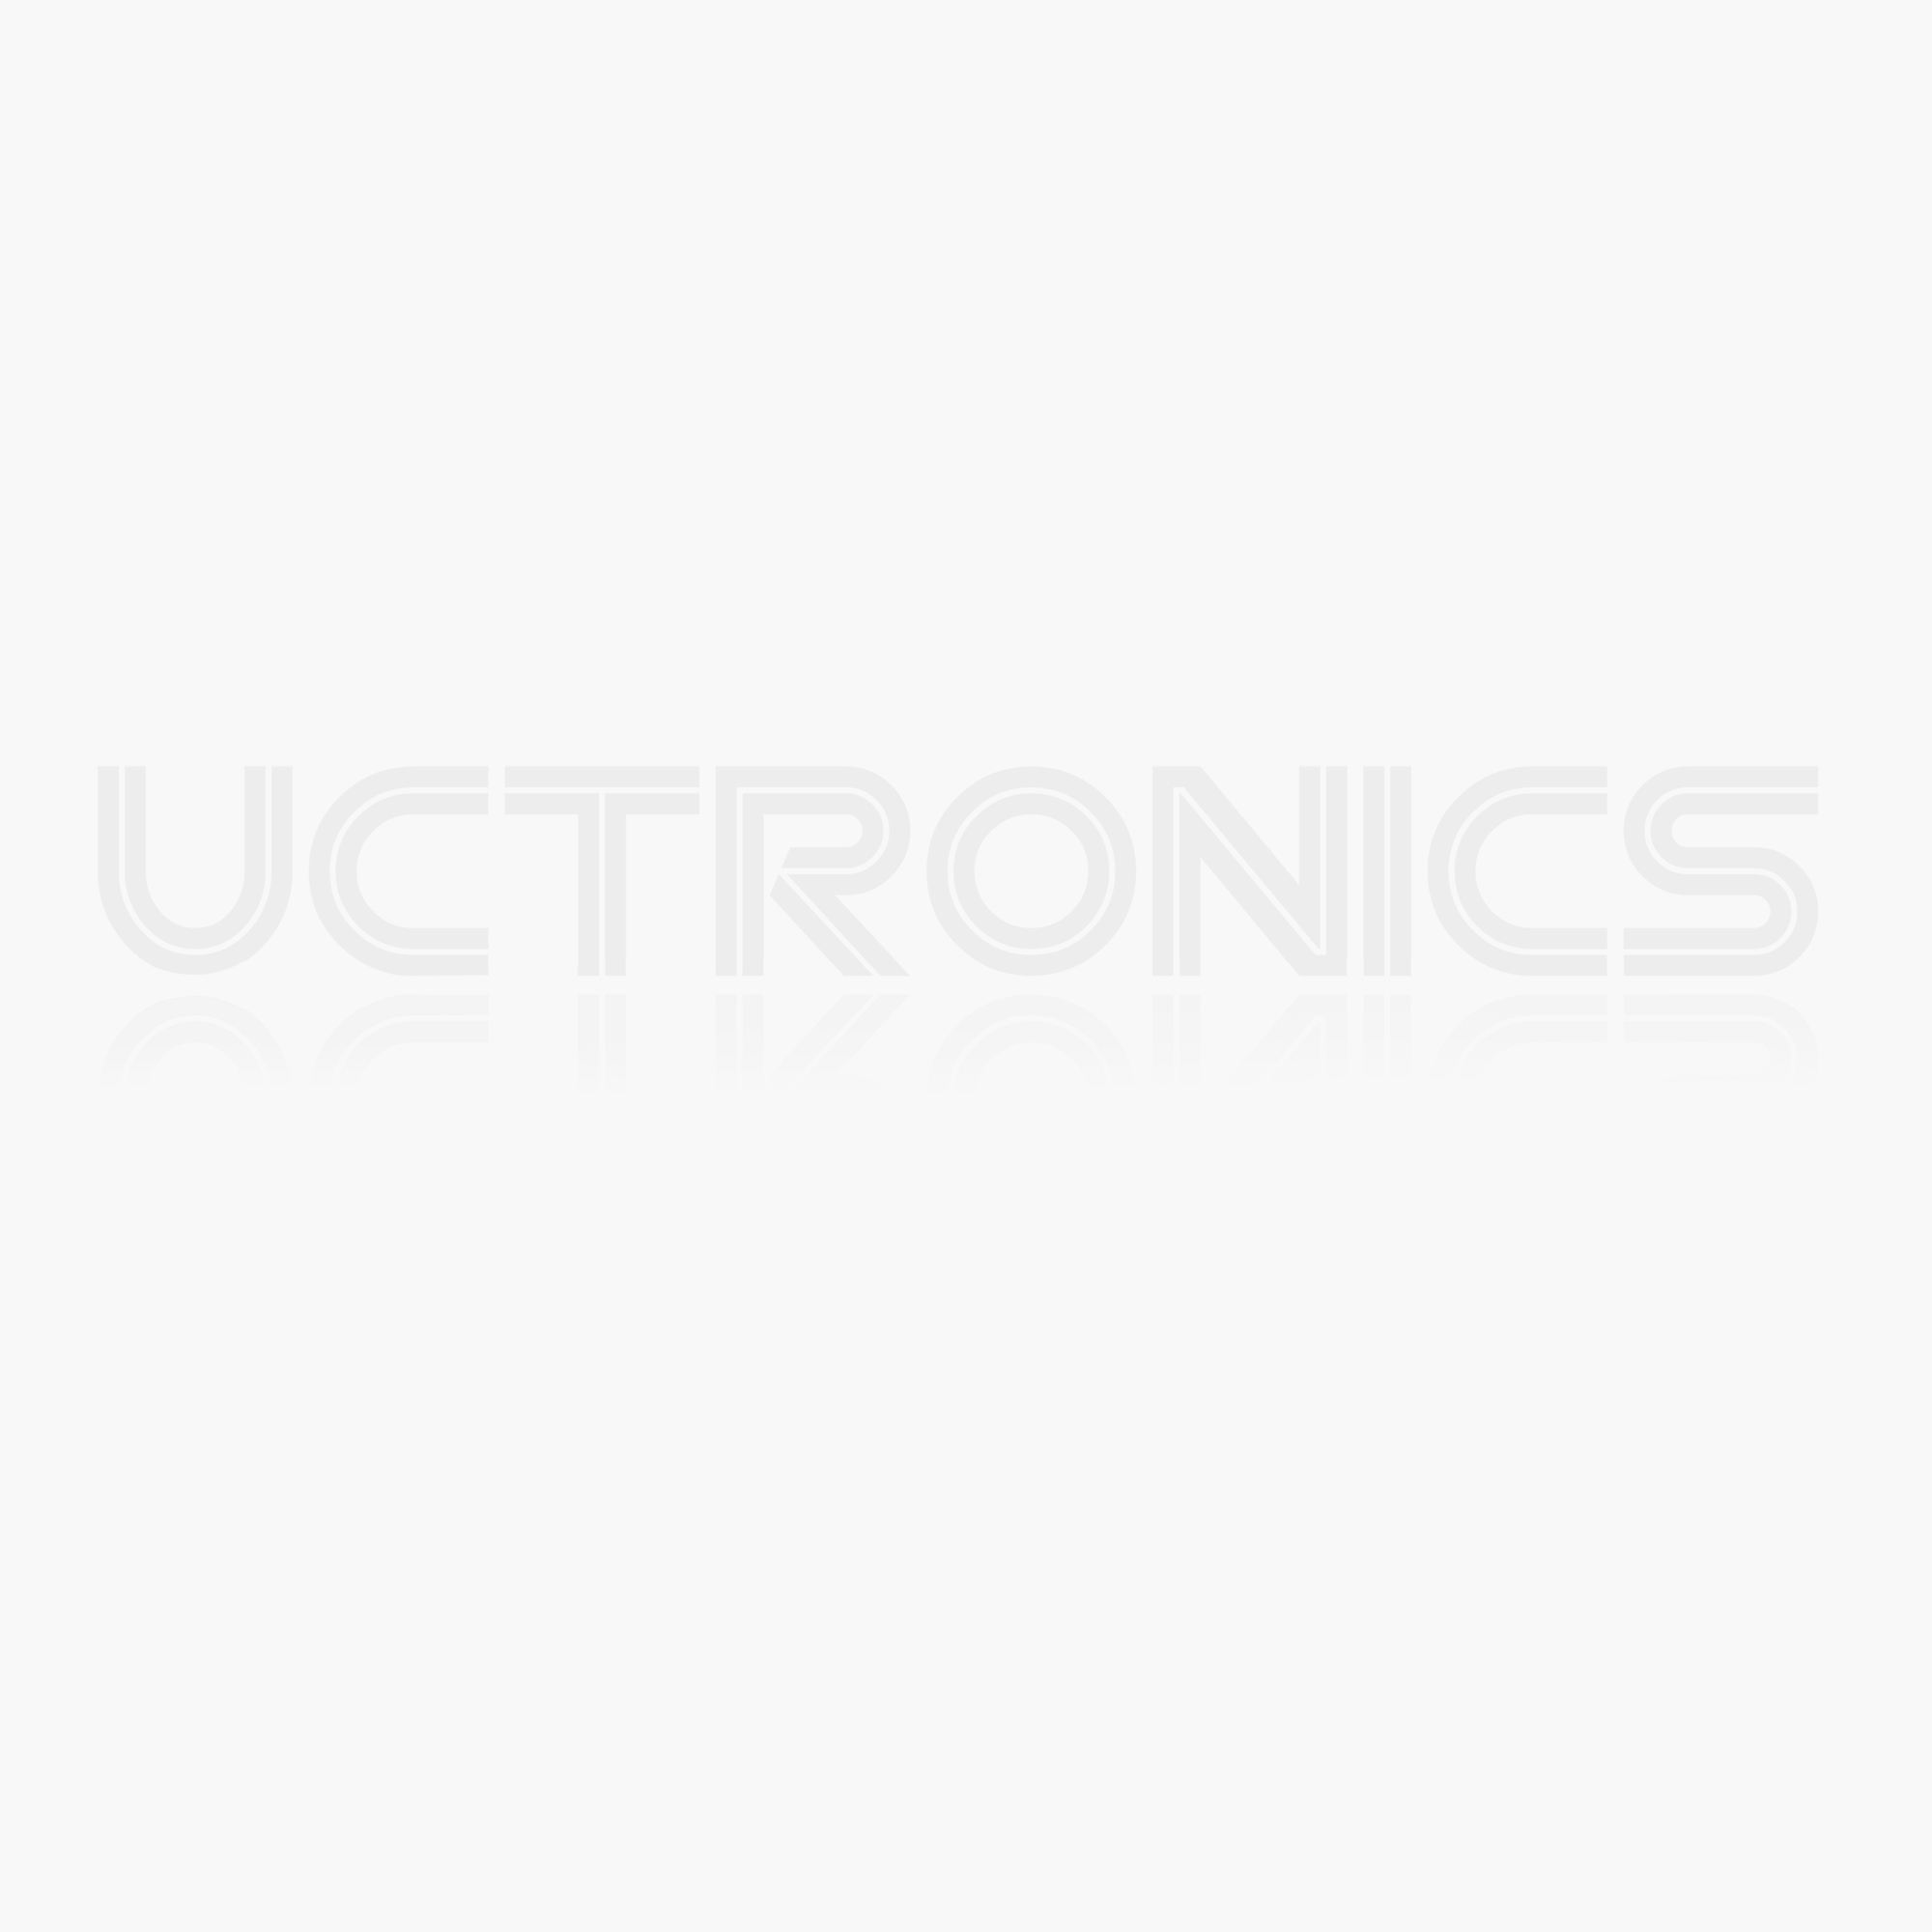 PLCC20 to DIP20 EZ Programmer adapter Socket